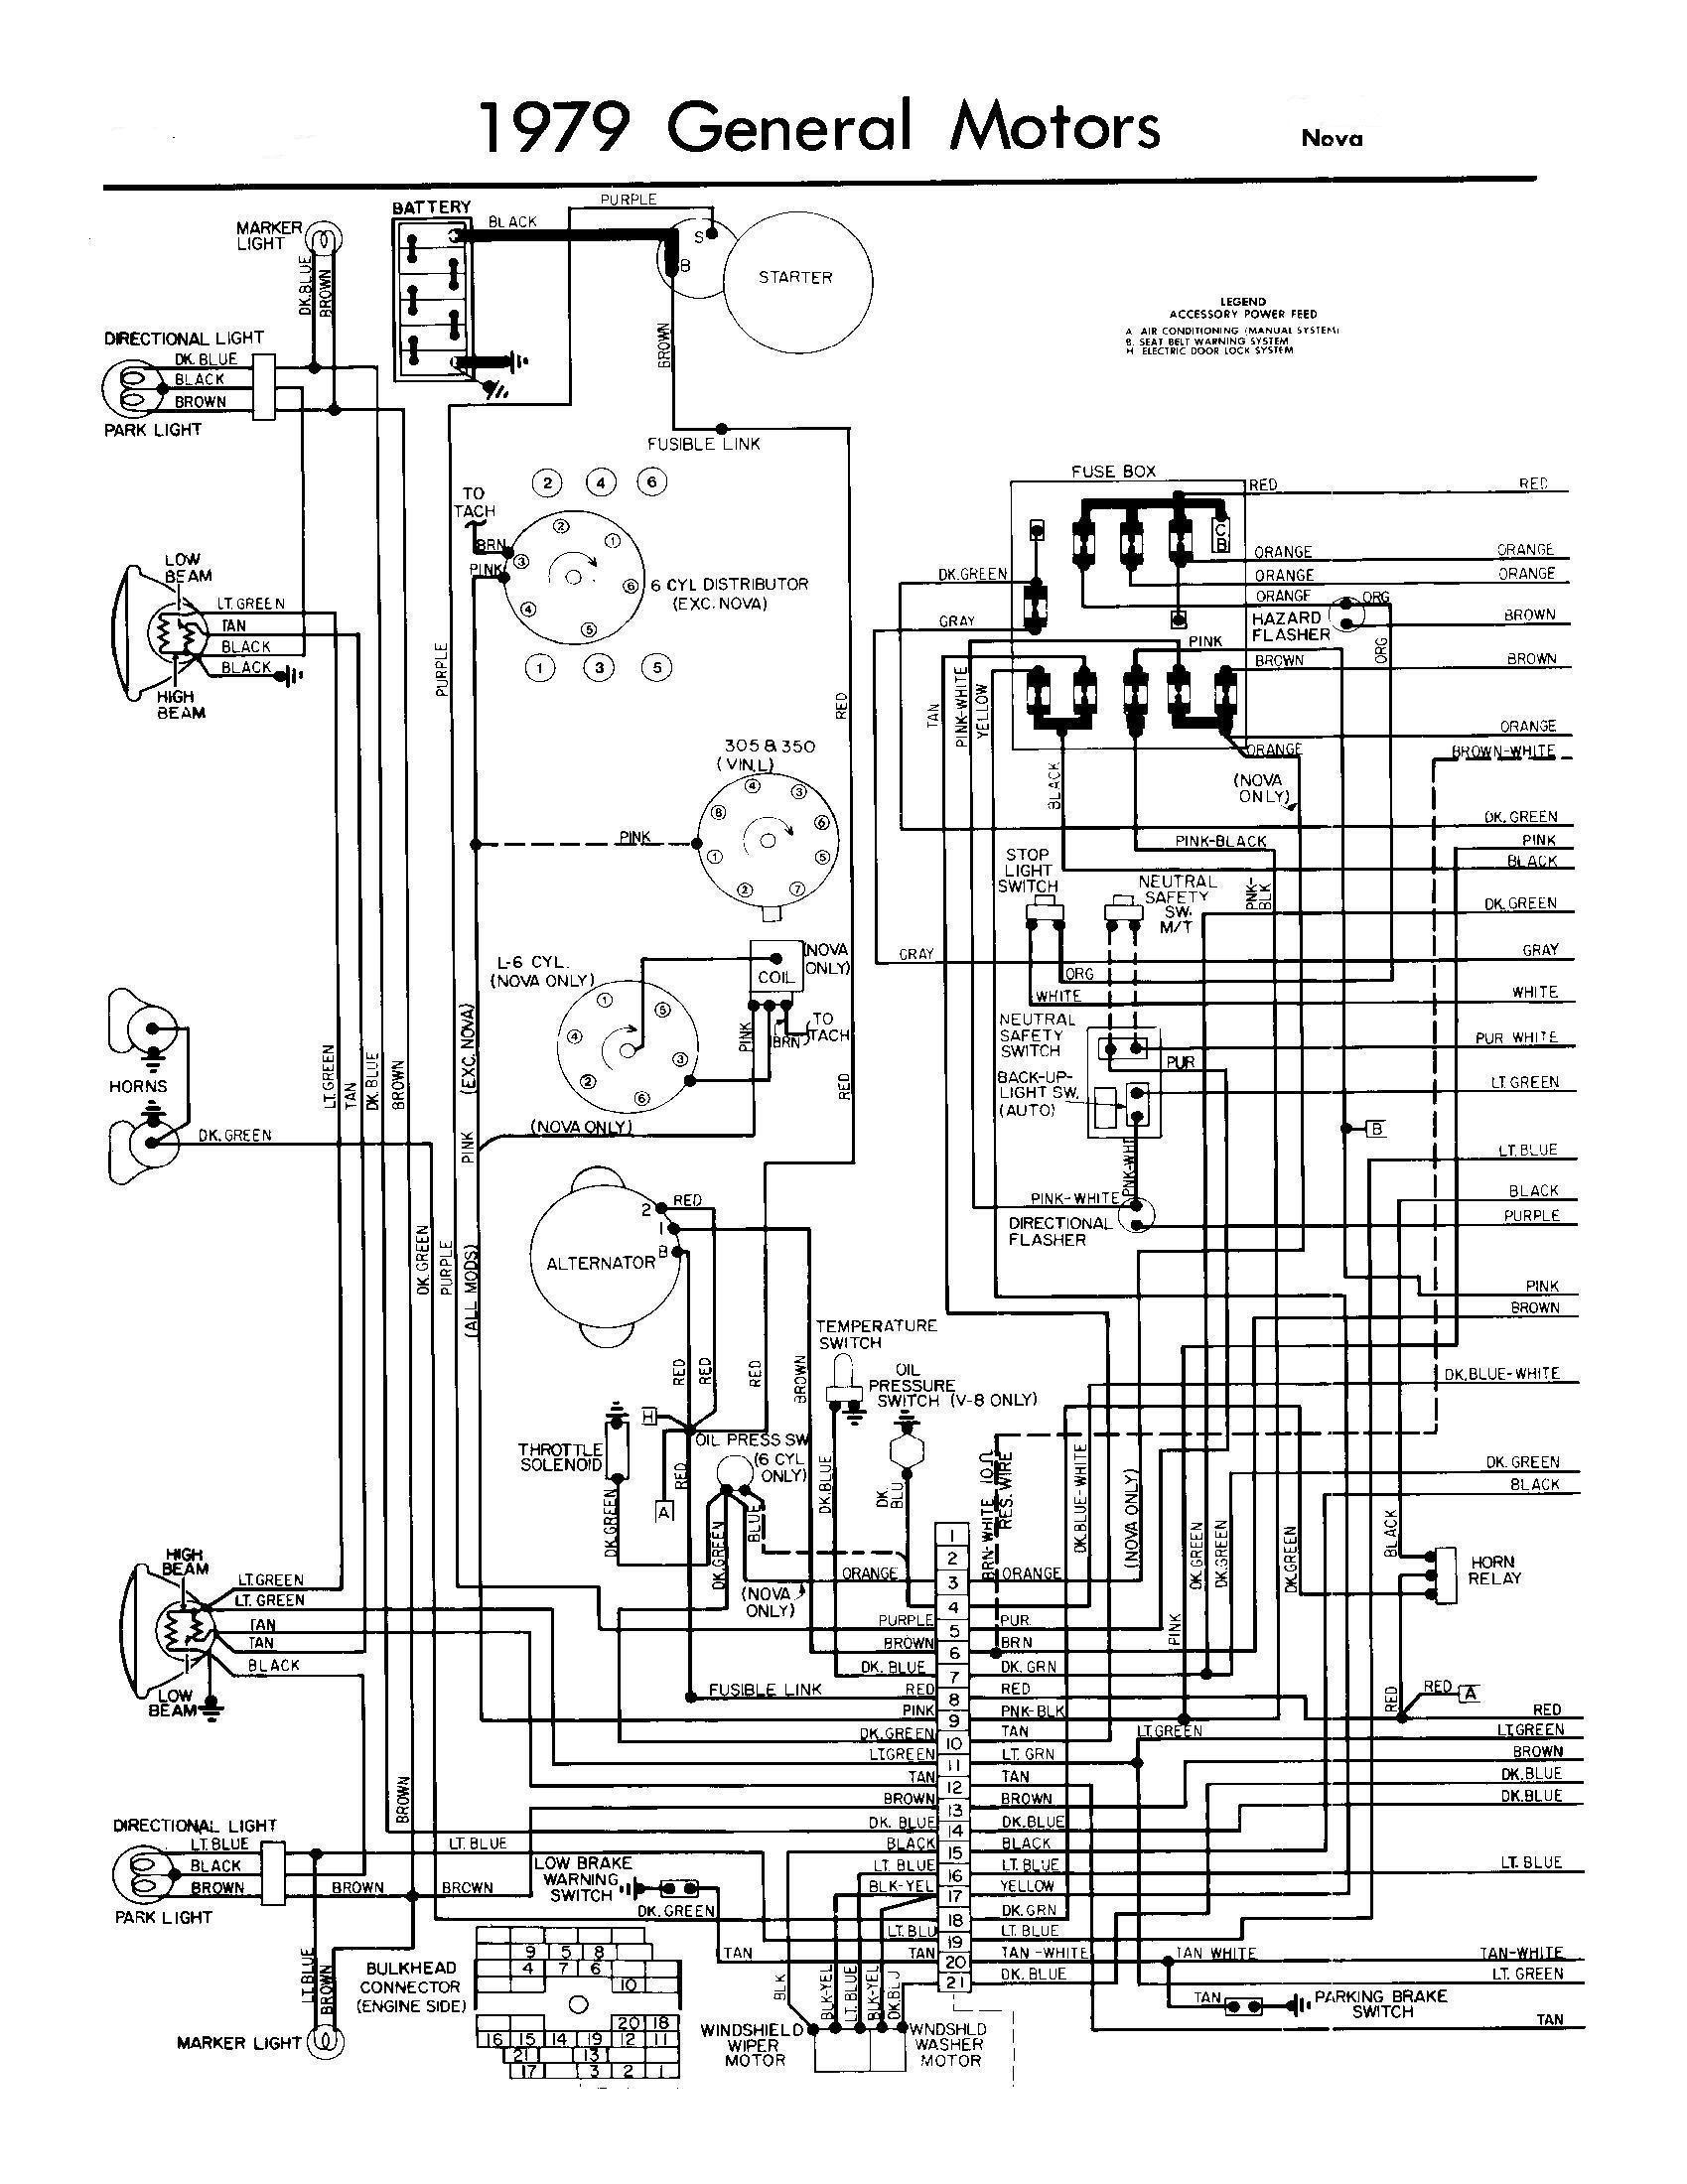 1966 Gmc Wiring Rpo - Wiring Diagram state-warehouse-a -  state-warehouse-a.piuconzero.it [ 2200 x 1699 Pixel ]